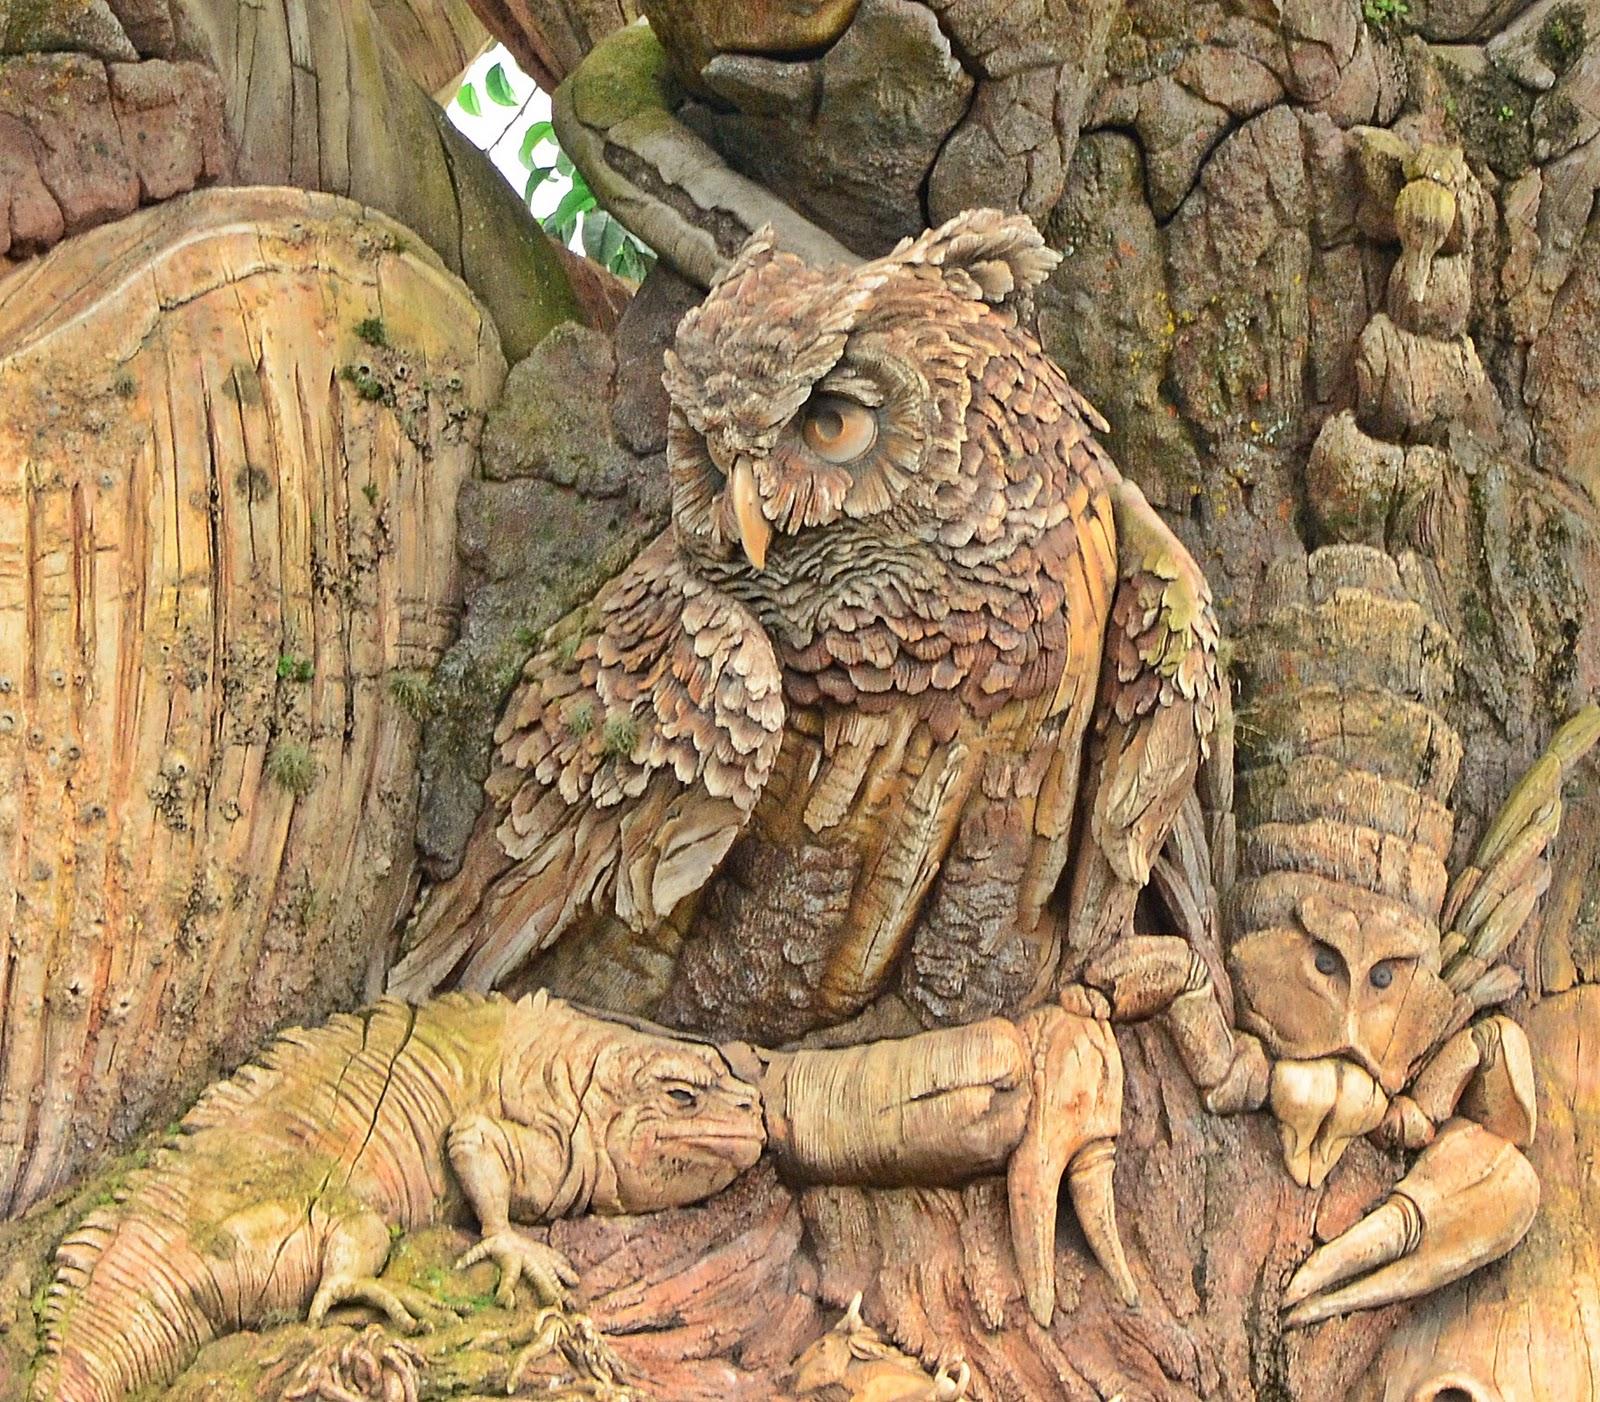 Dina s city wildlife adventures disney sights at animal